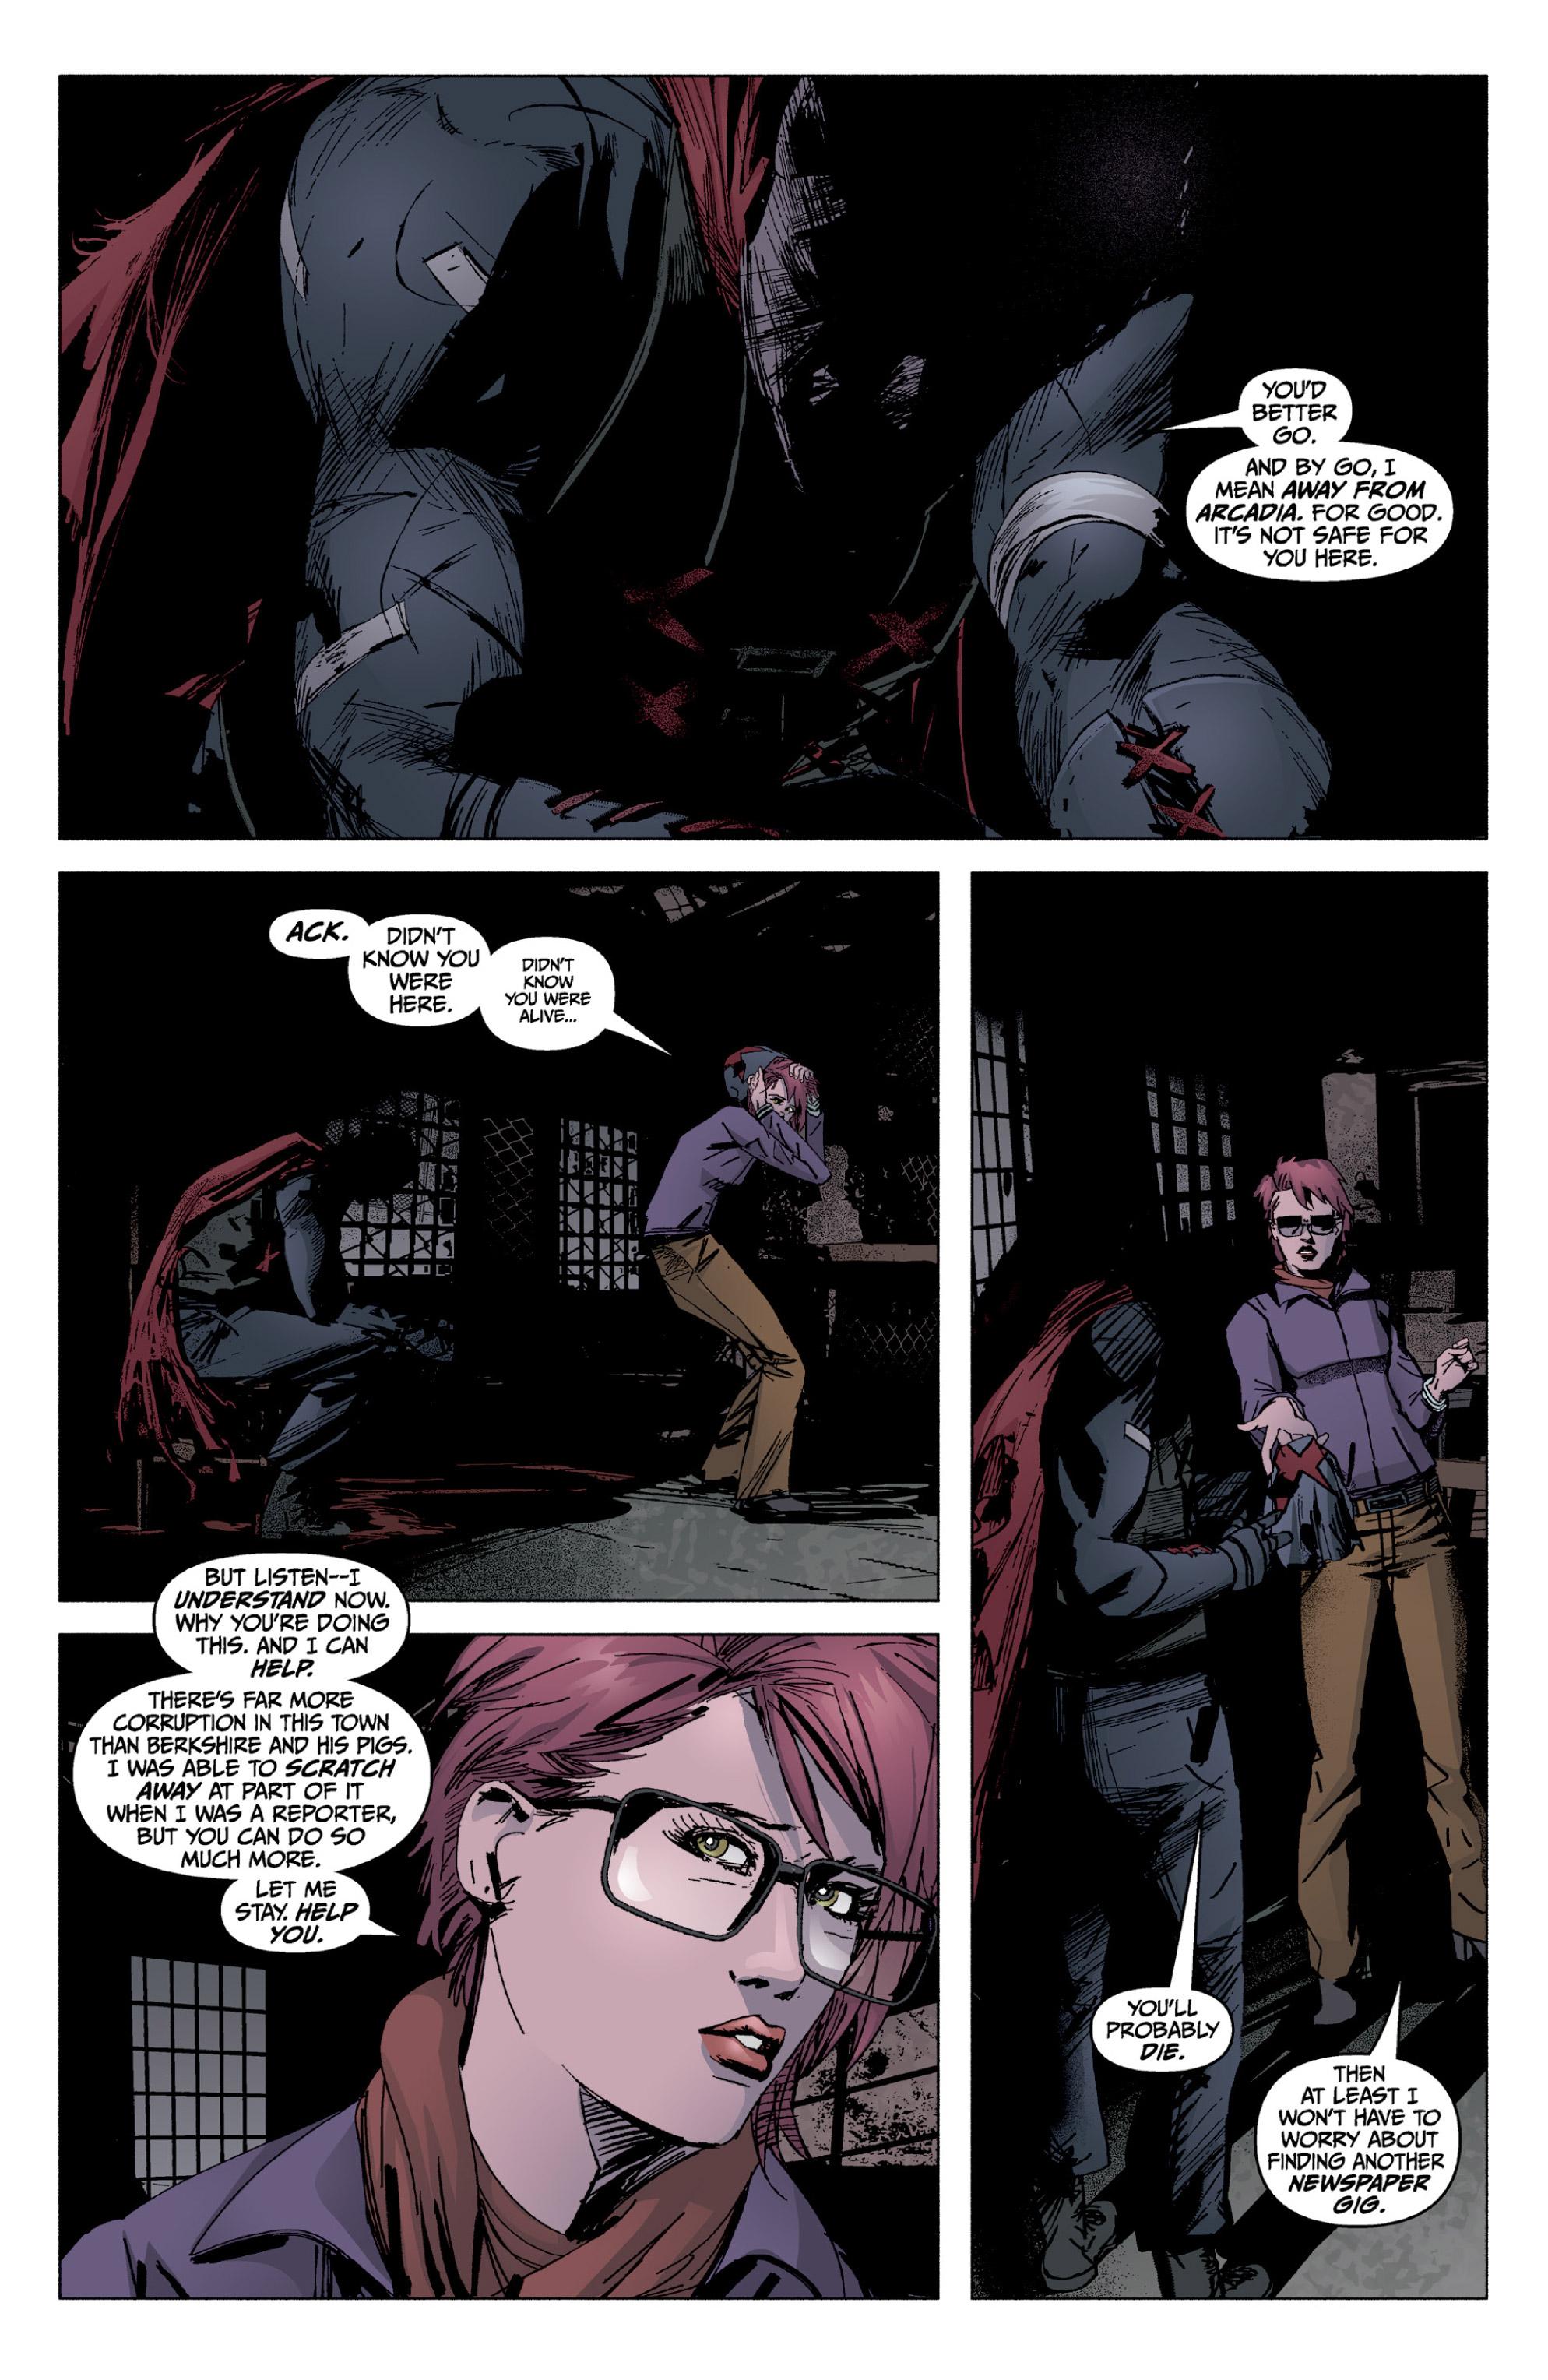 Read online X: Big Bad comic -  Issue # Full - 124